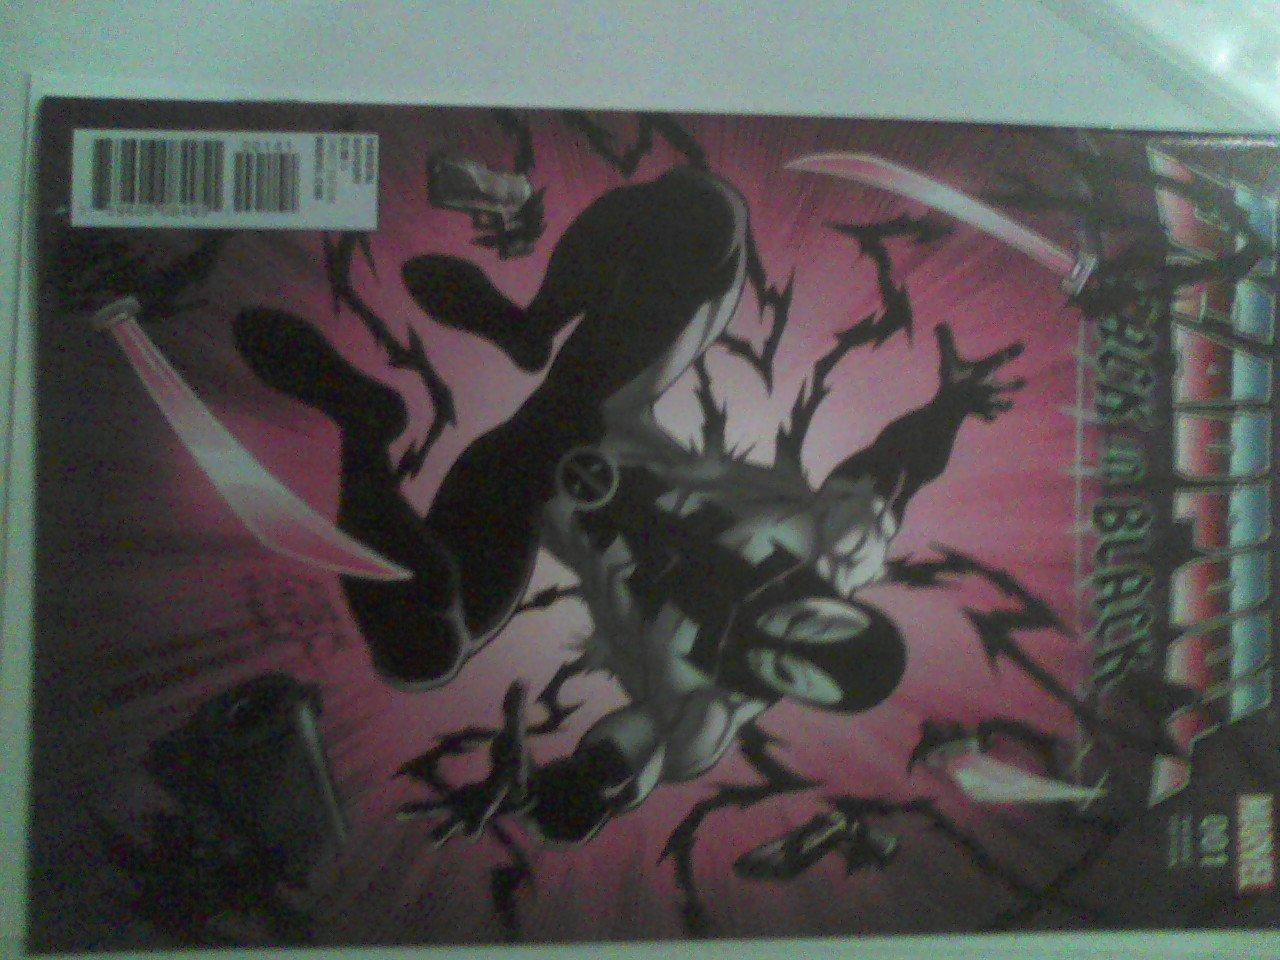 Deadpool back in black #1 variant cover